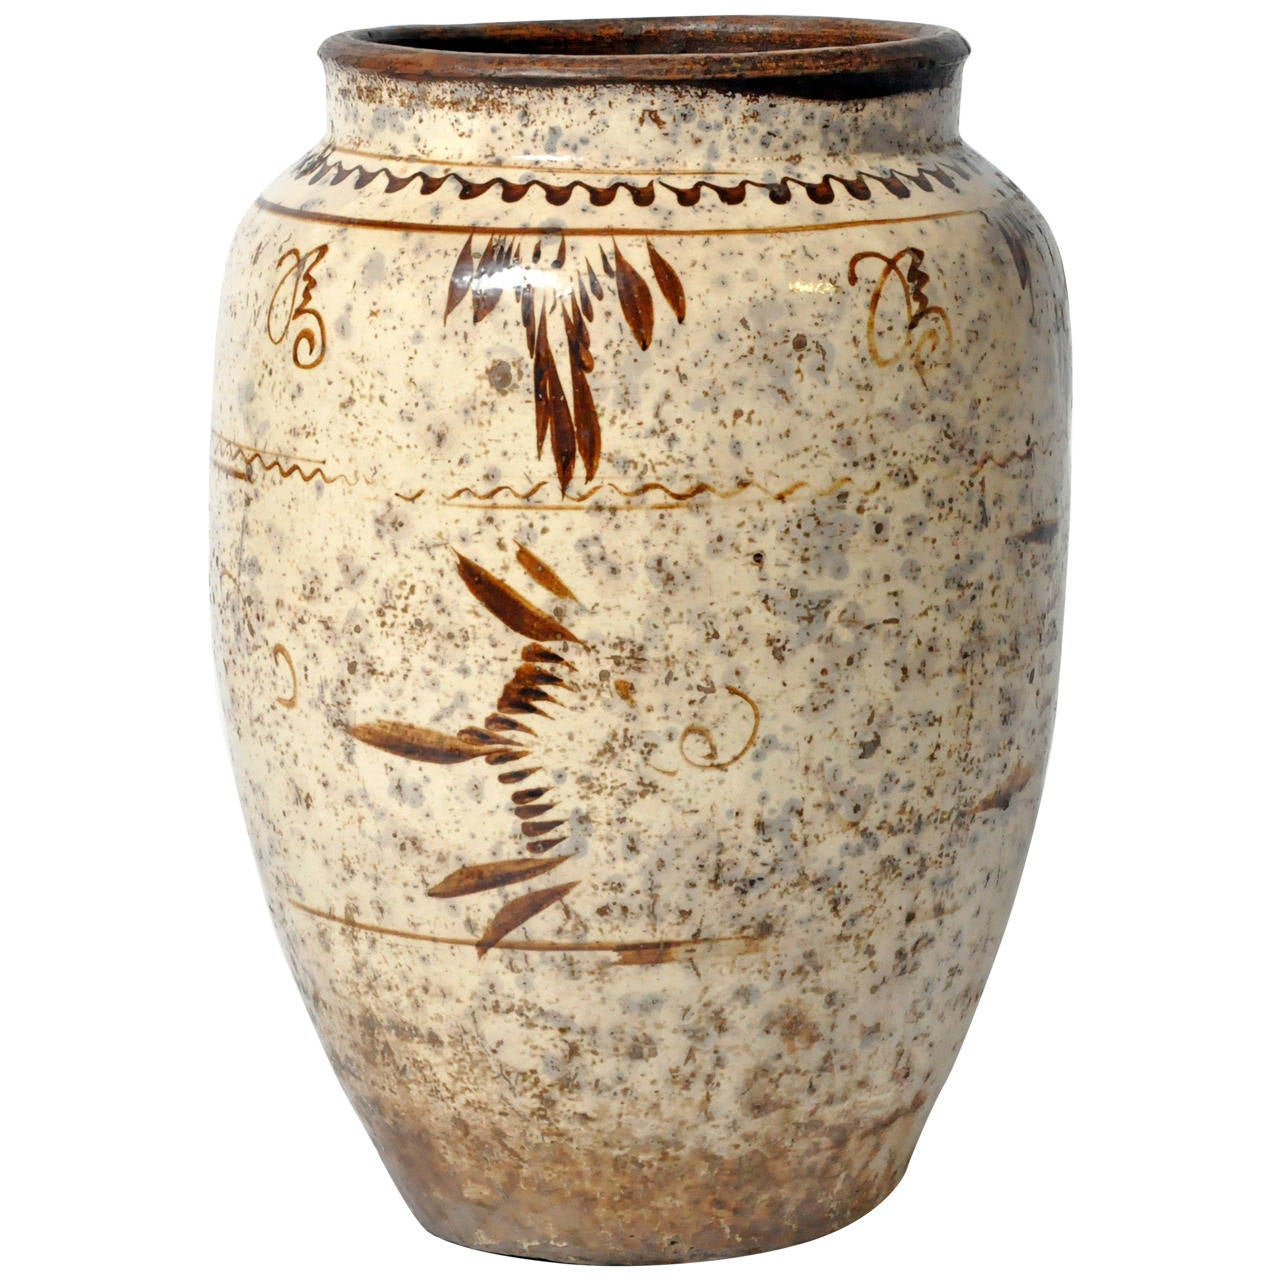 Chinese Ceramic Vase For Sale